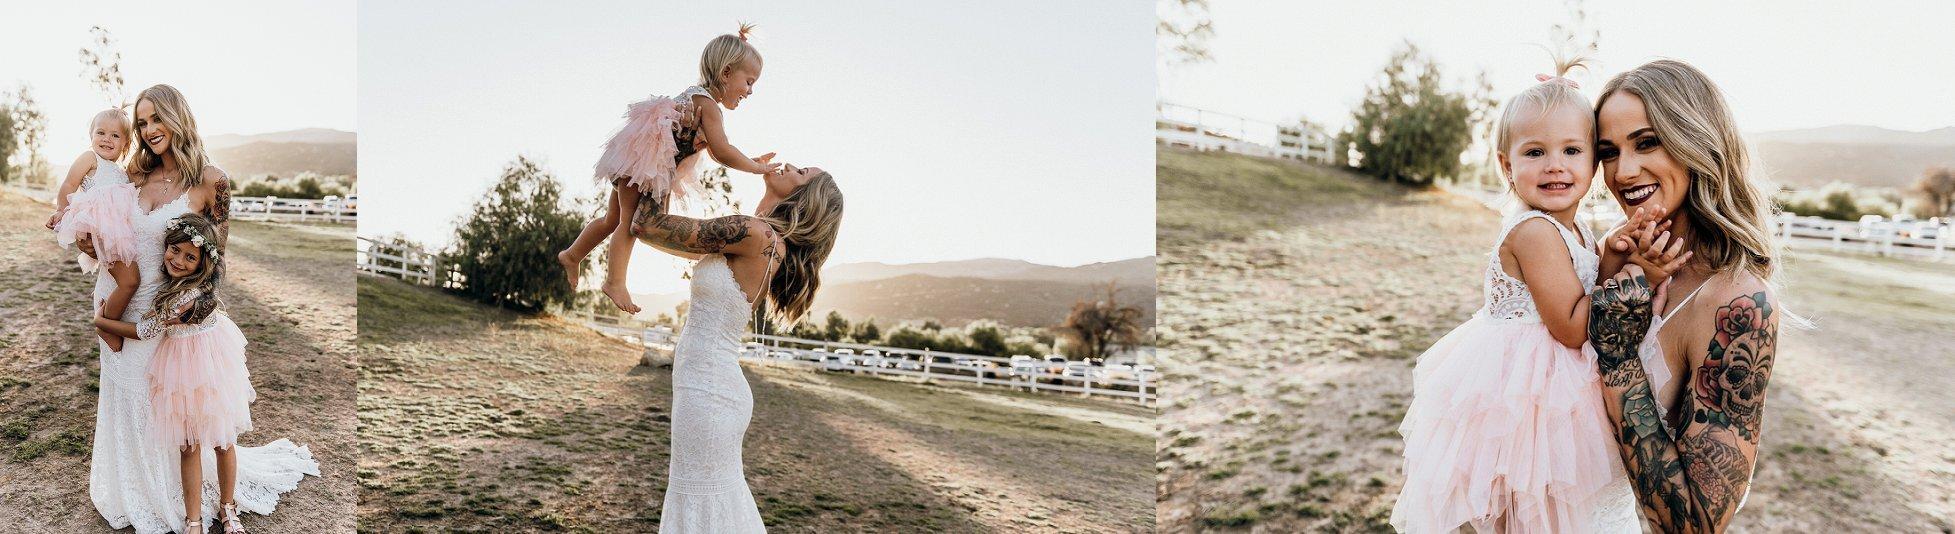 San Diego Wedding Photography La Bonita Ranch_0128.jpg